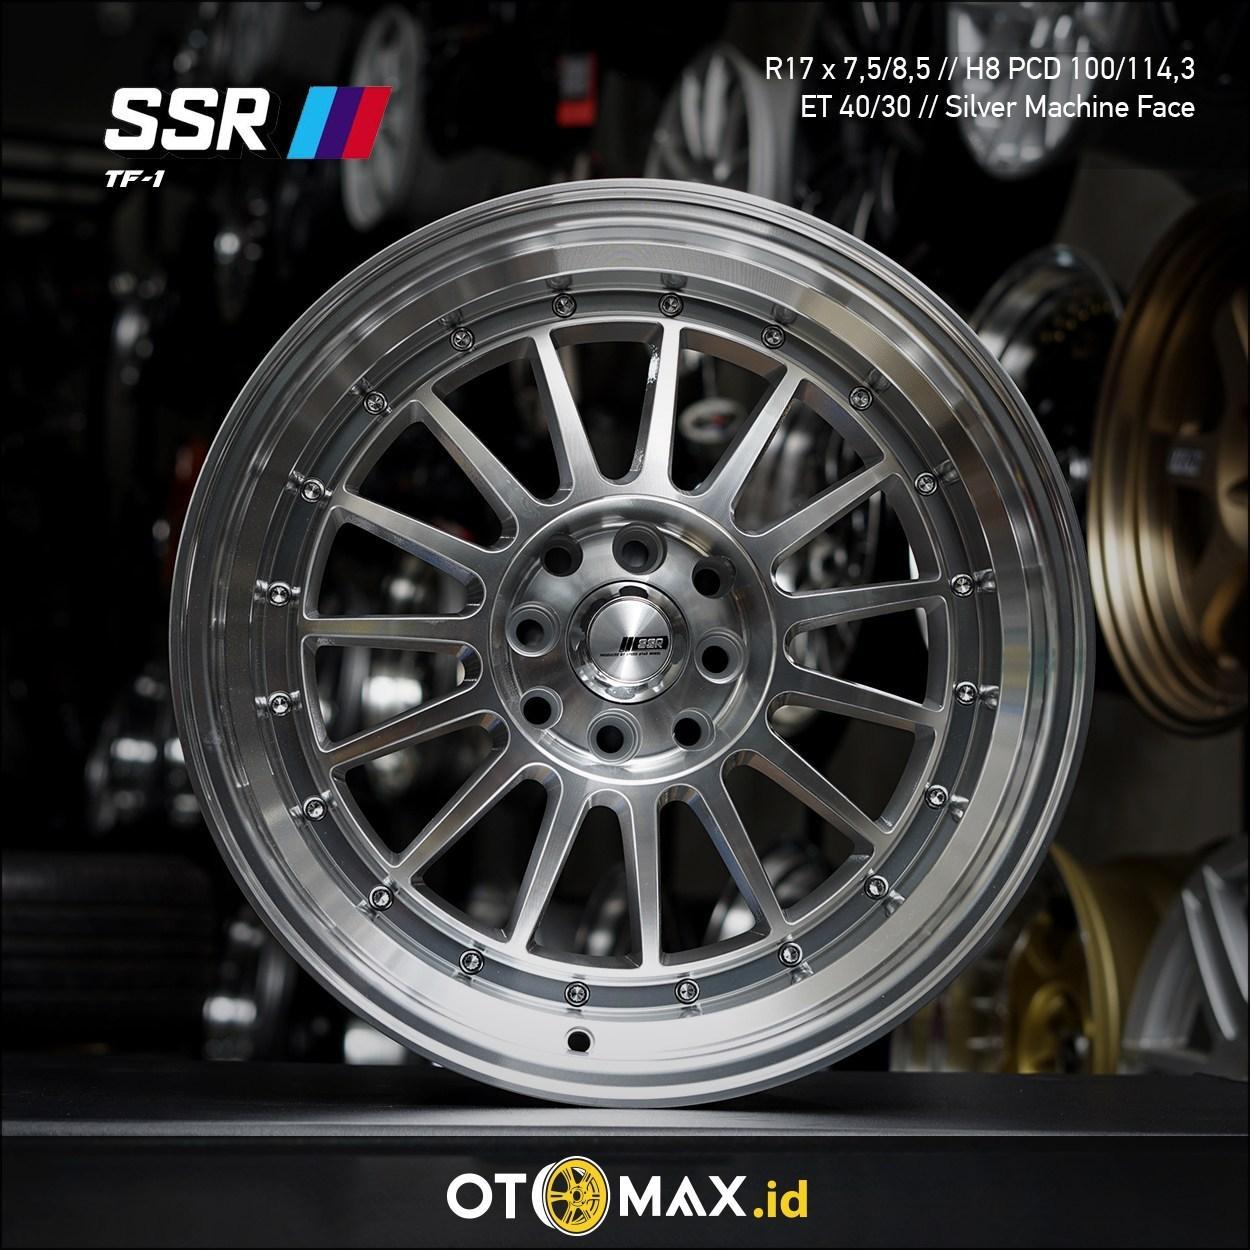 Velg Mobil SSR TF-1 Ring 17 Silver Machine Face Lip+CR